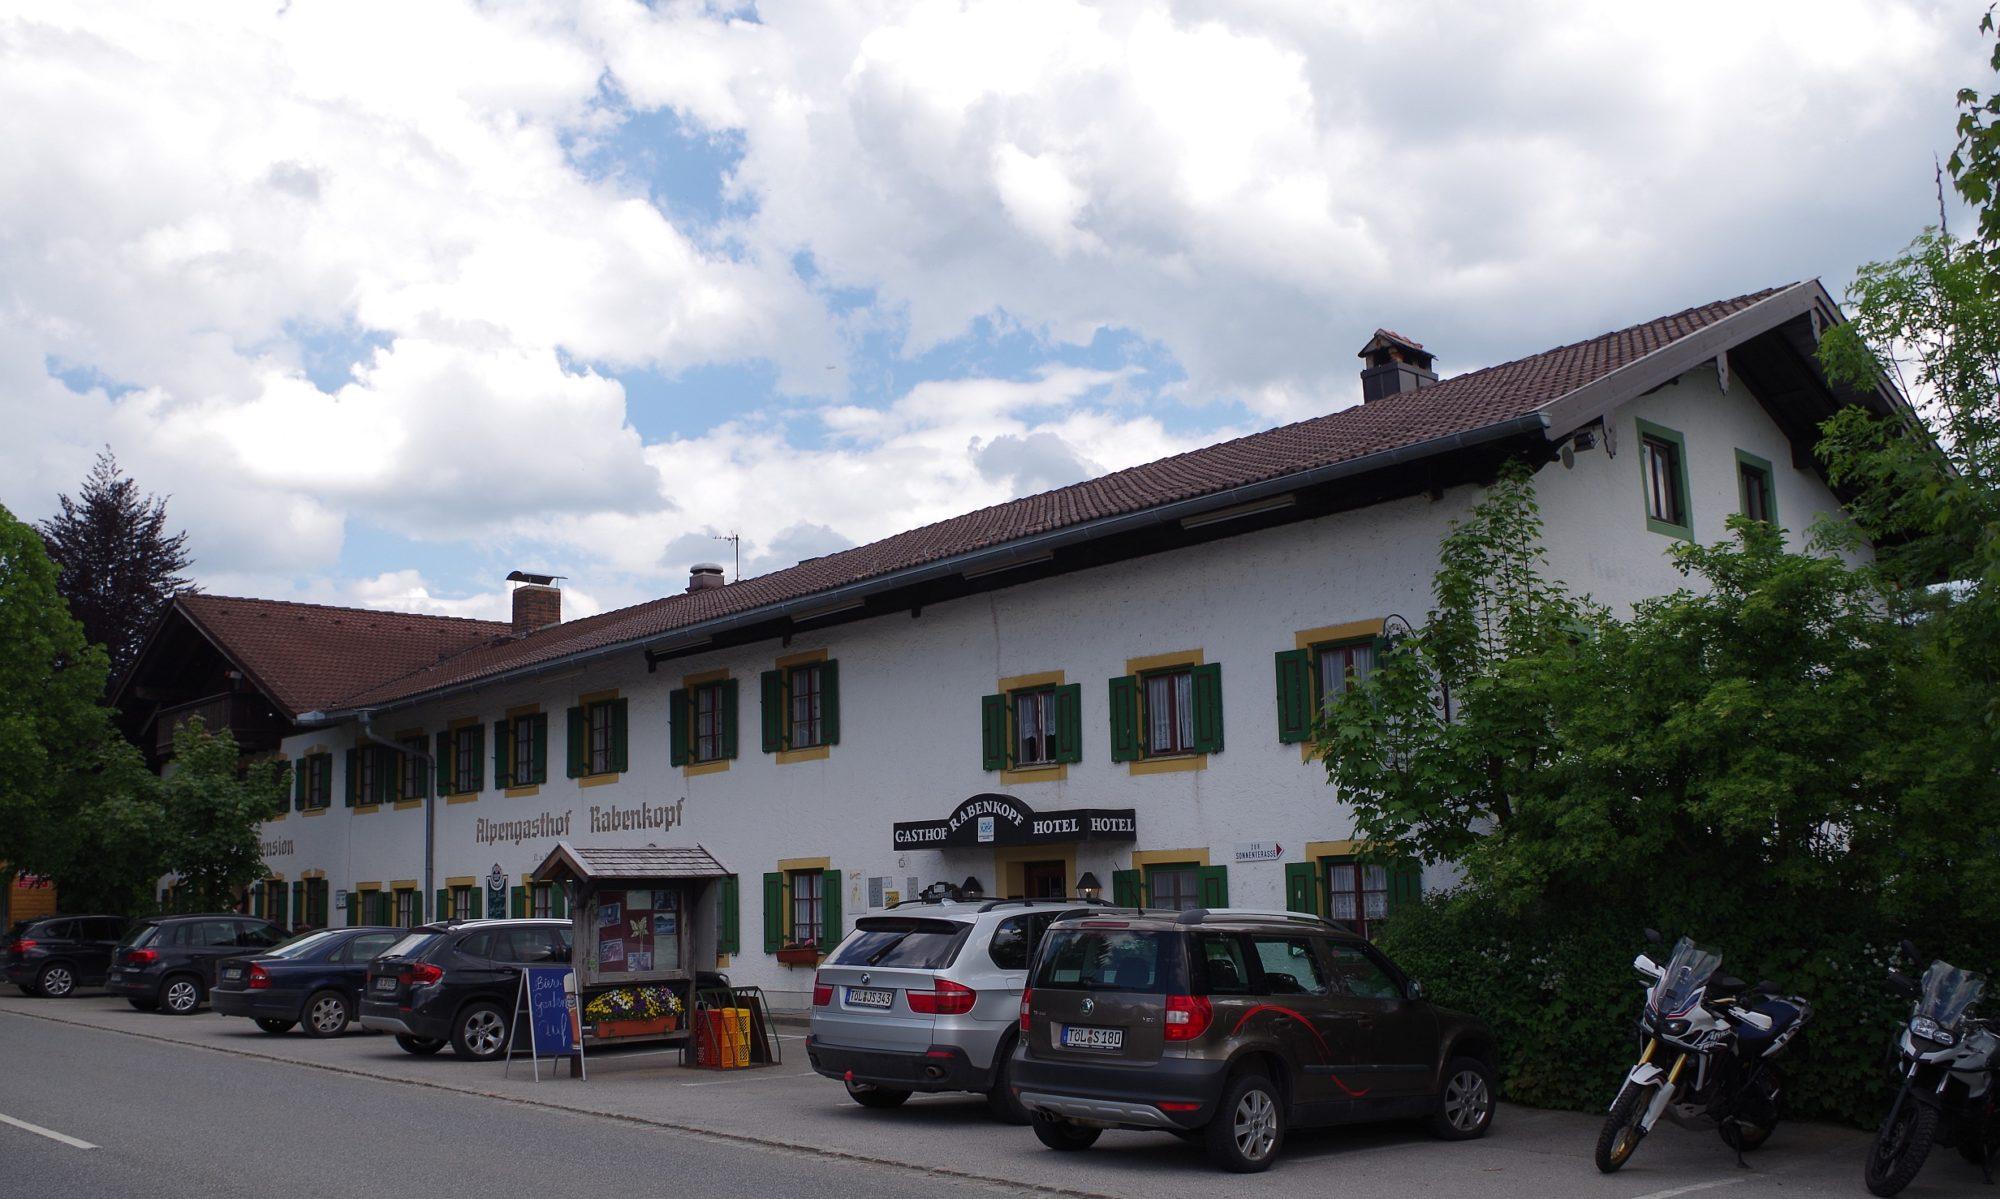 Alpengasthof Rabenkopf